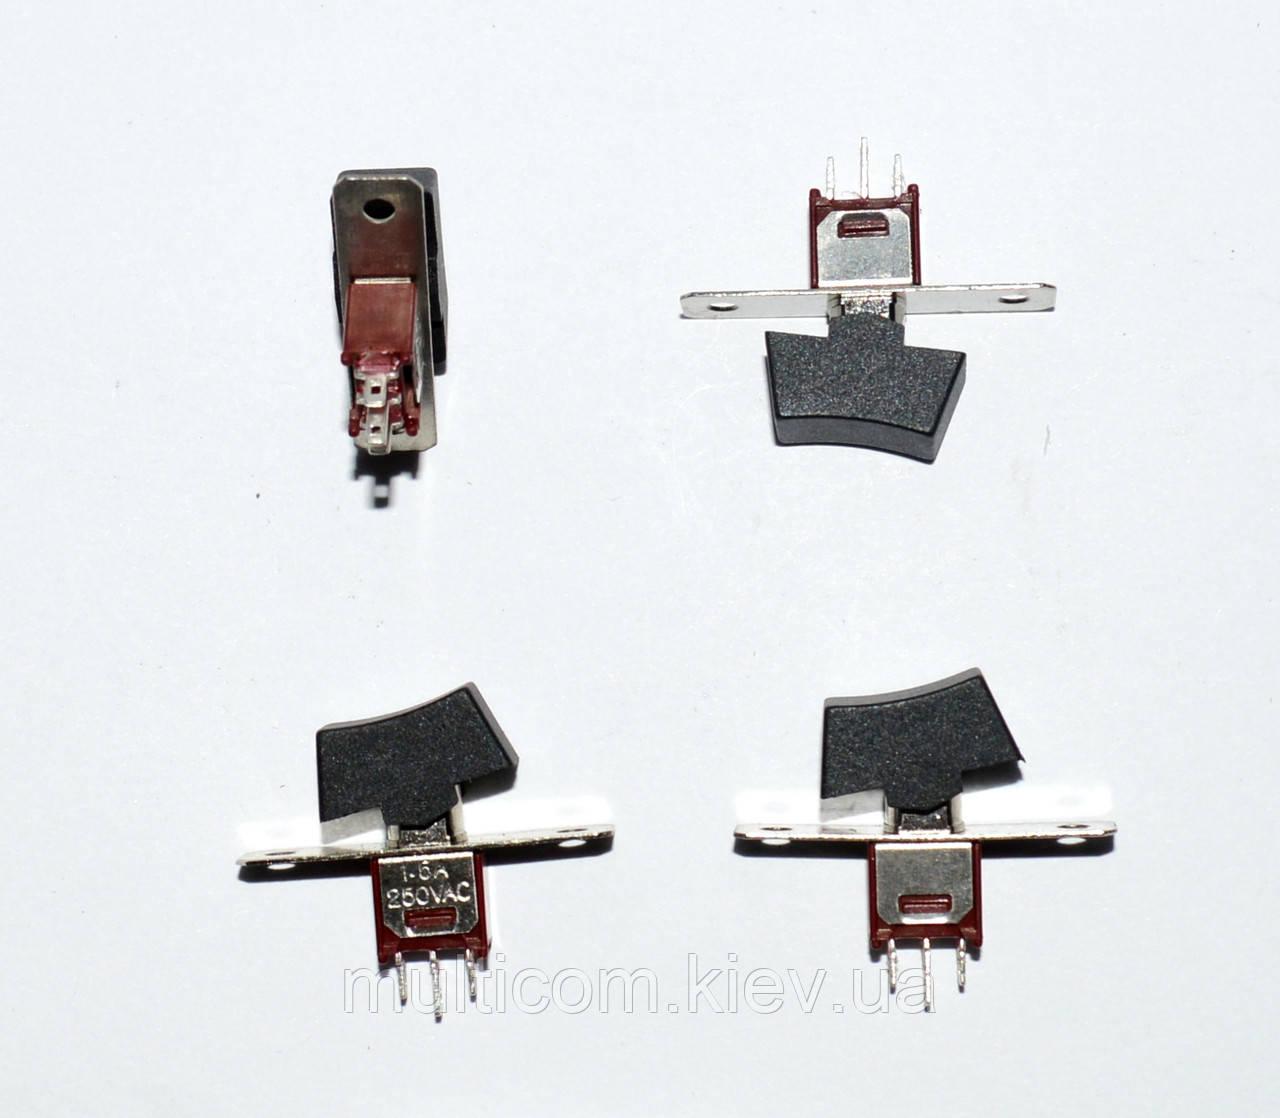 11-00-009. Тумблер с клавишей SRLS-102-A1 (ON-ON), 3pin, 1,5A 250VAC